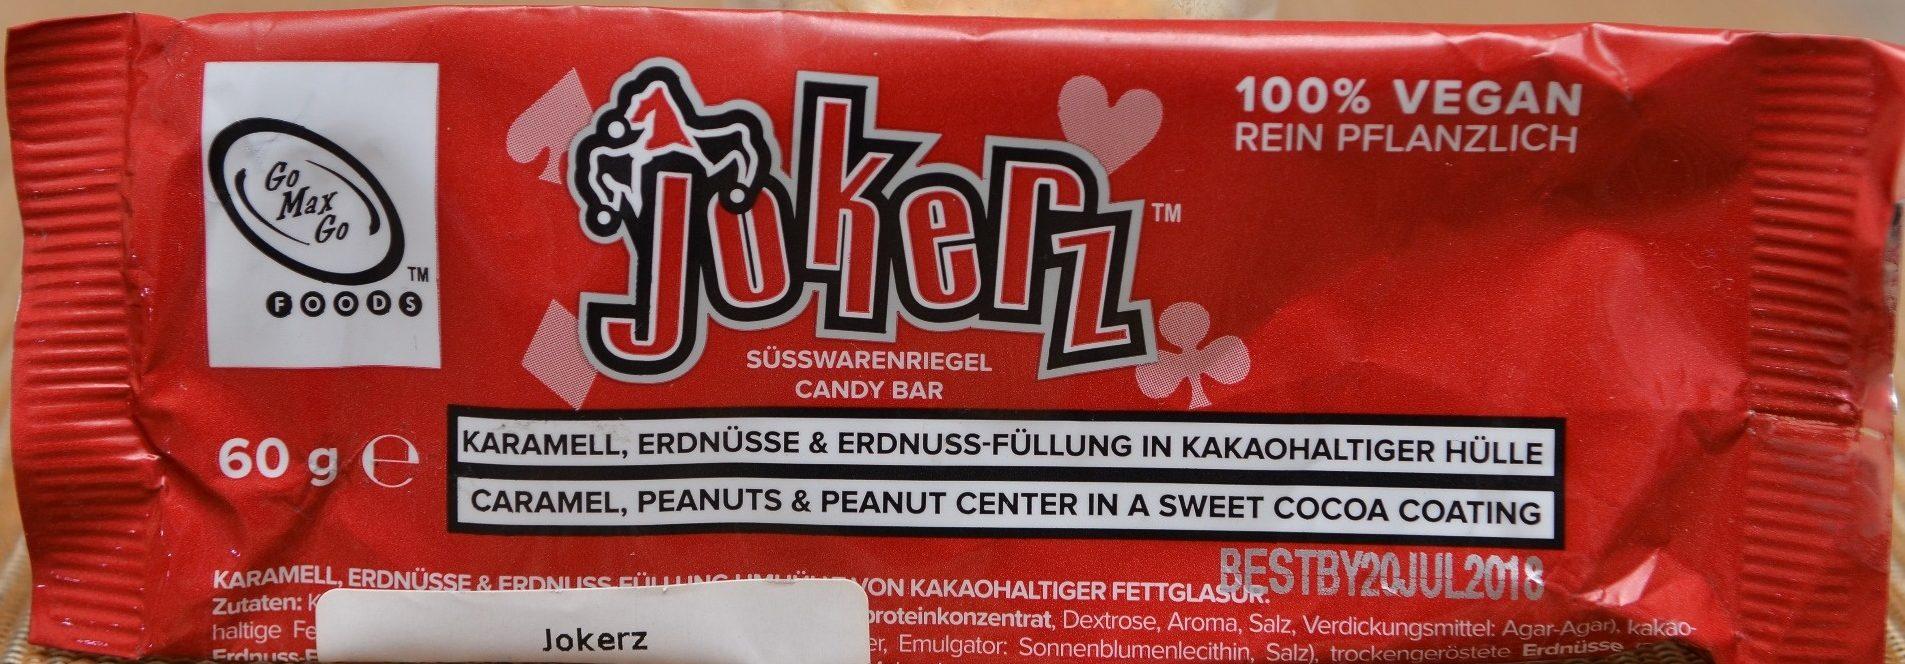 Jokerz - Product